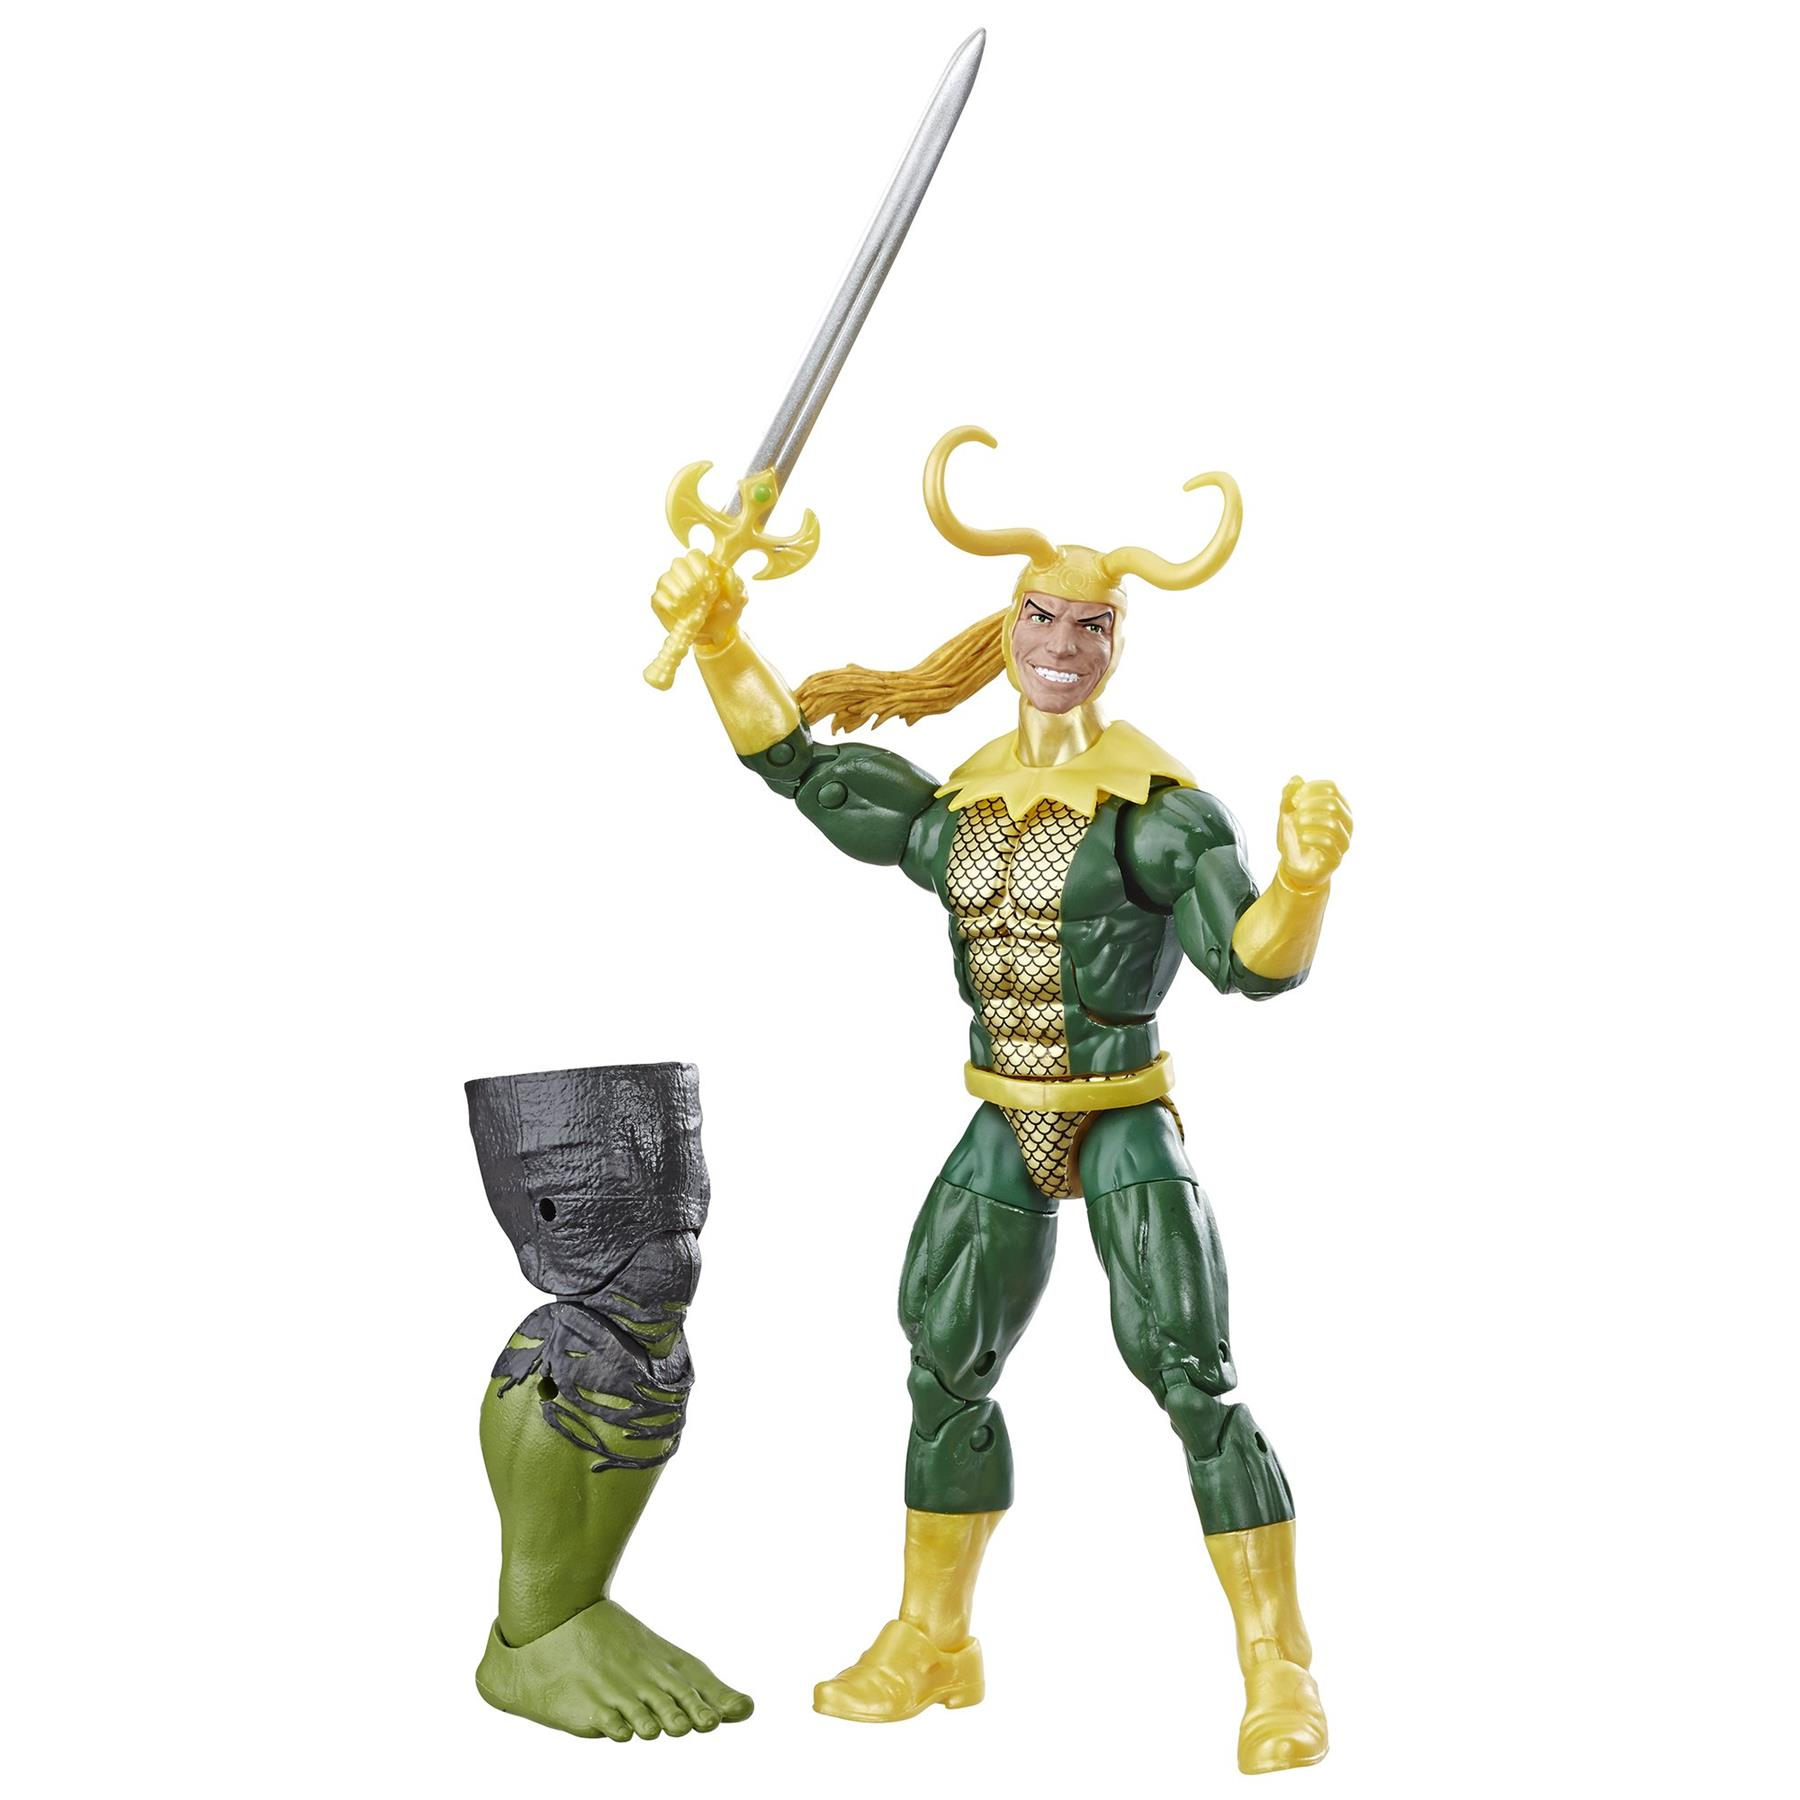 Marvel-Legends-Avengers-6-034-Action-Figures-Hulk-BAF thumbnail 5